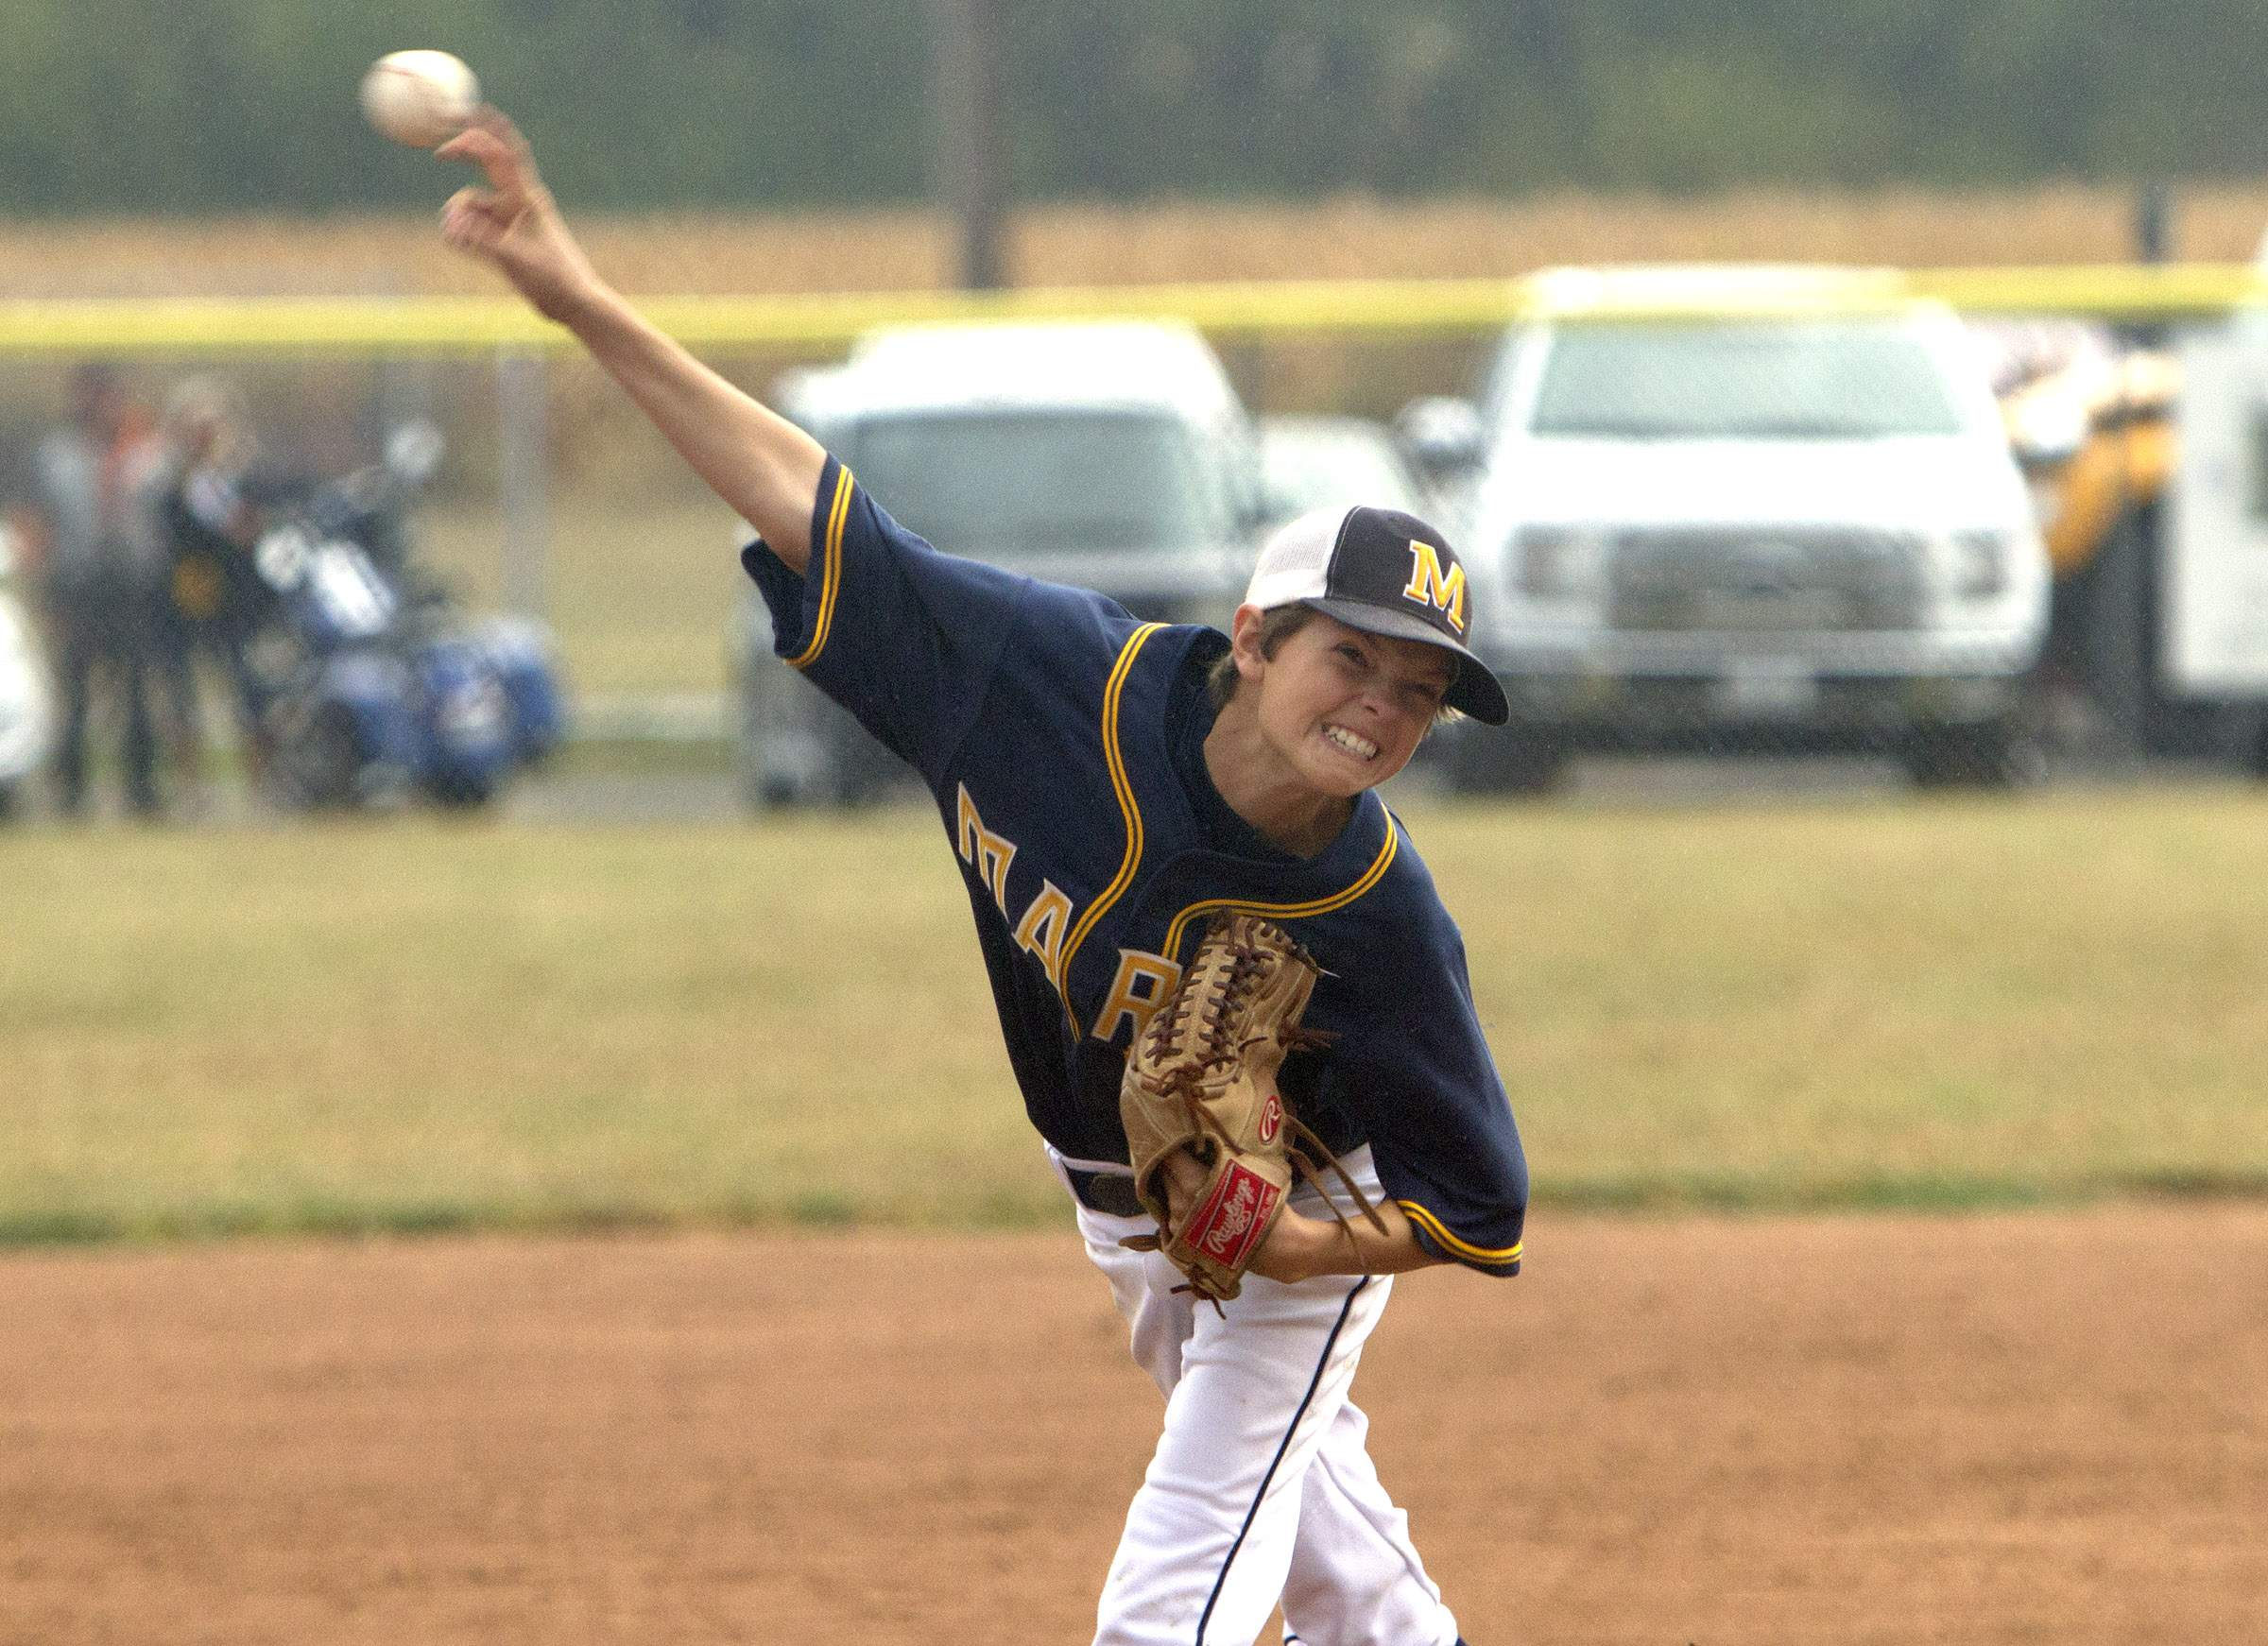 Kale Cameron throws a pitch.